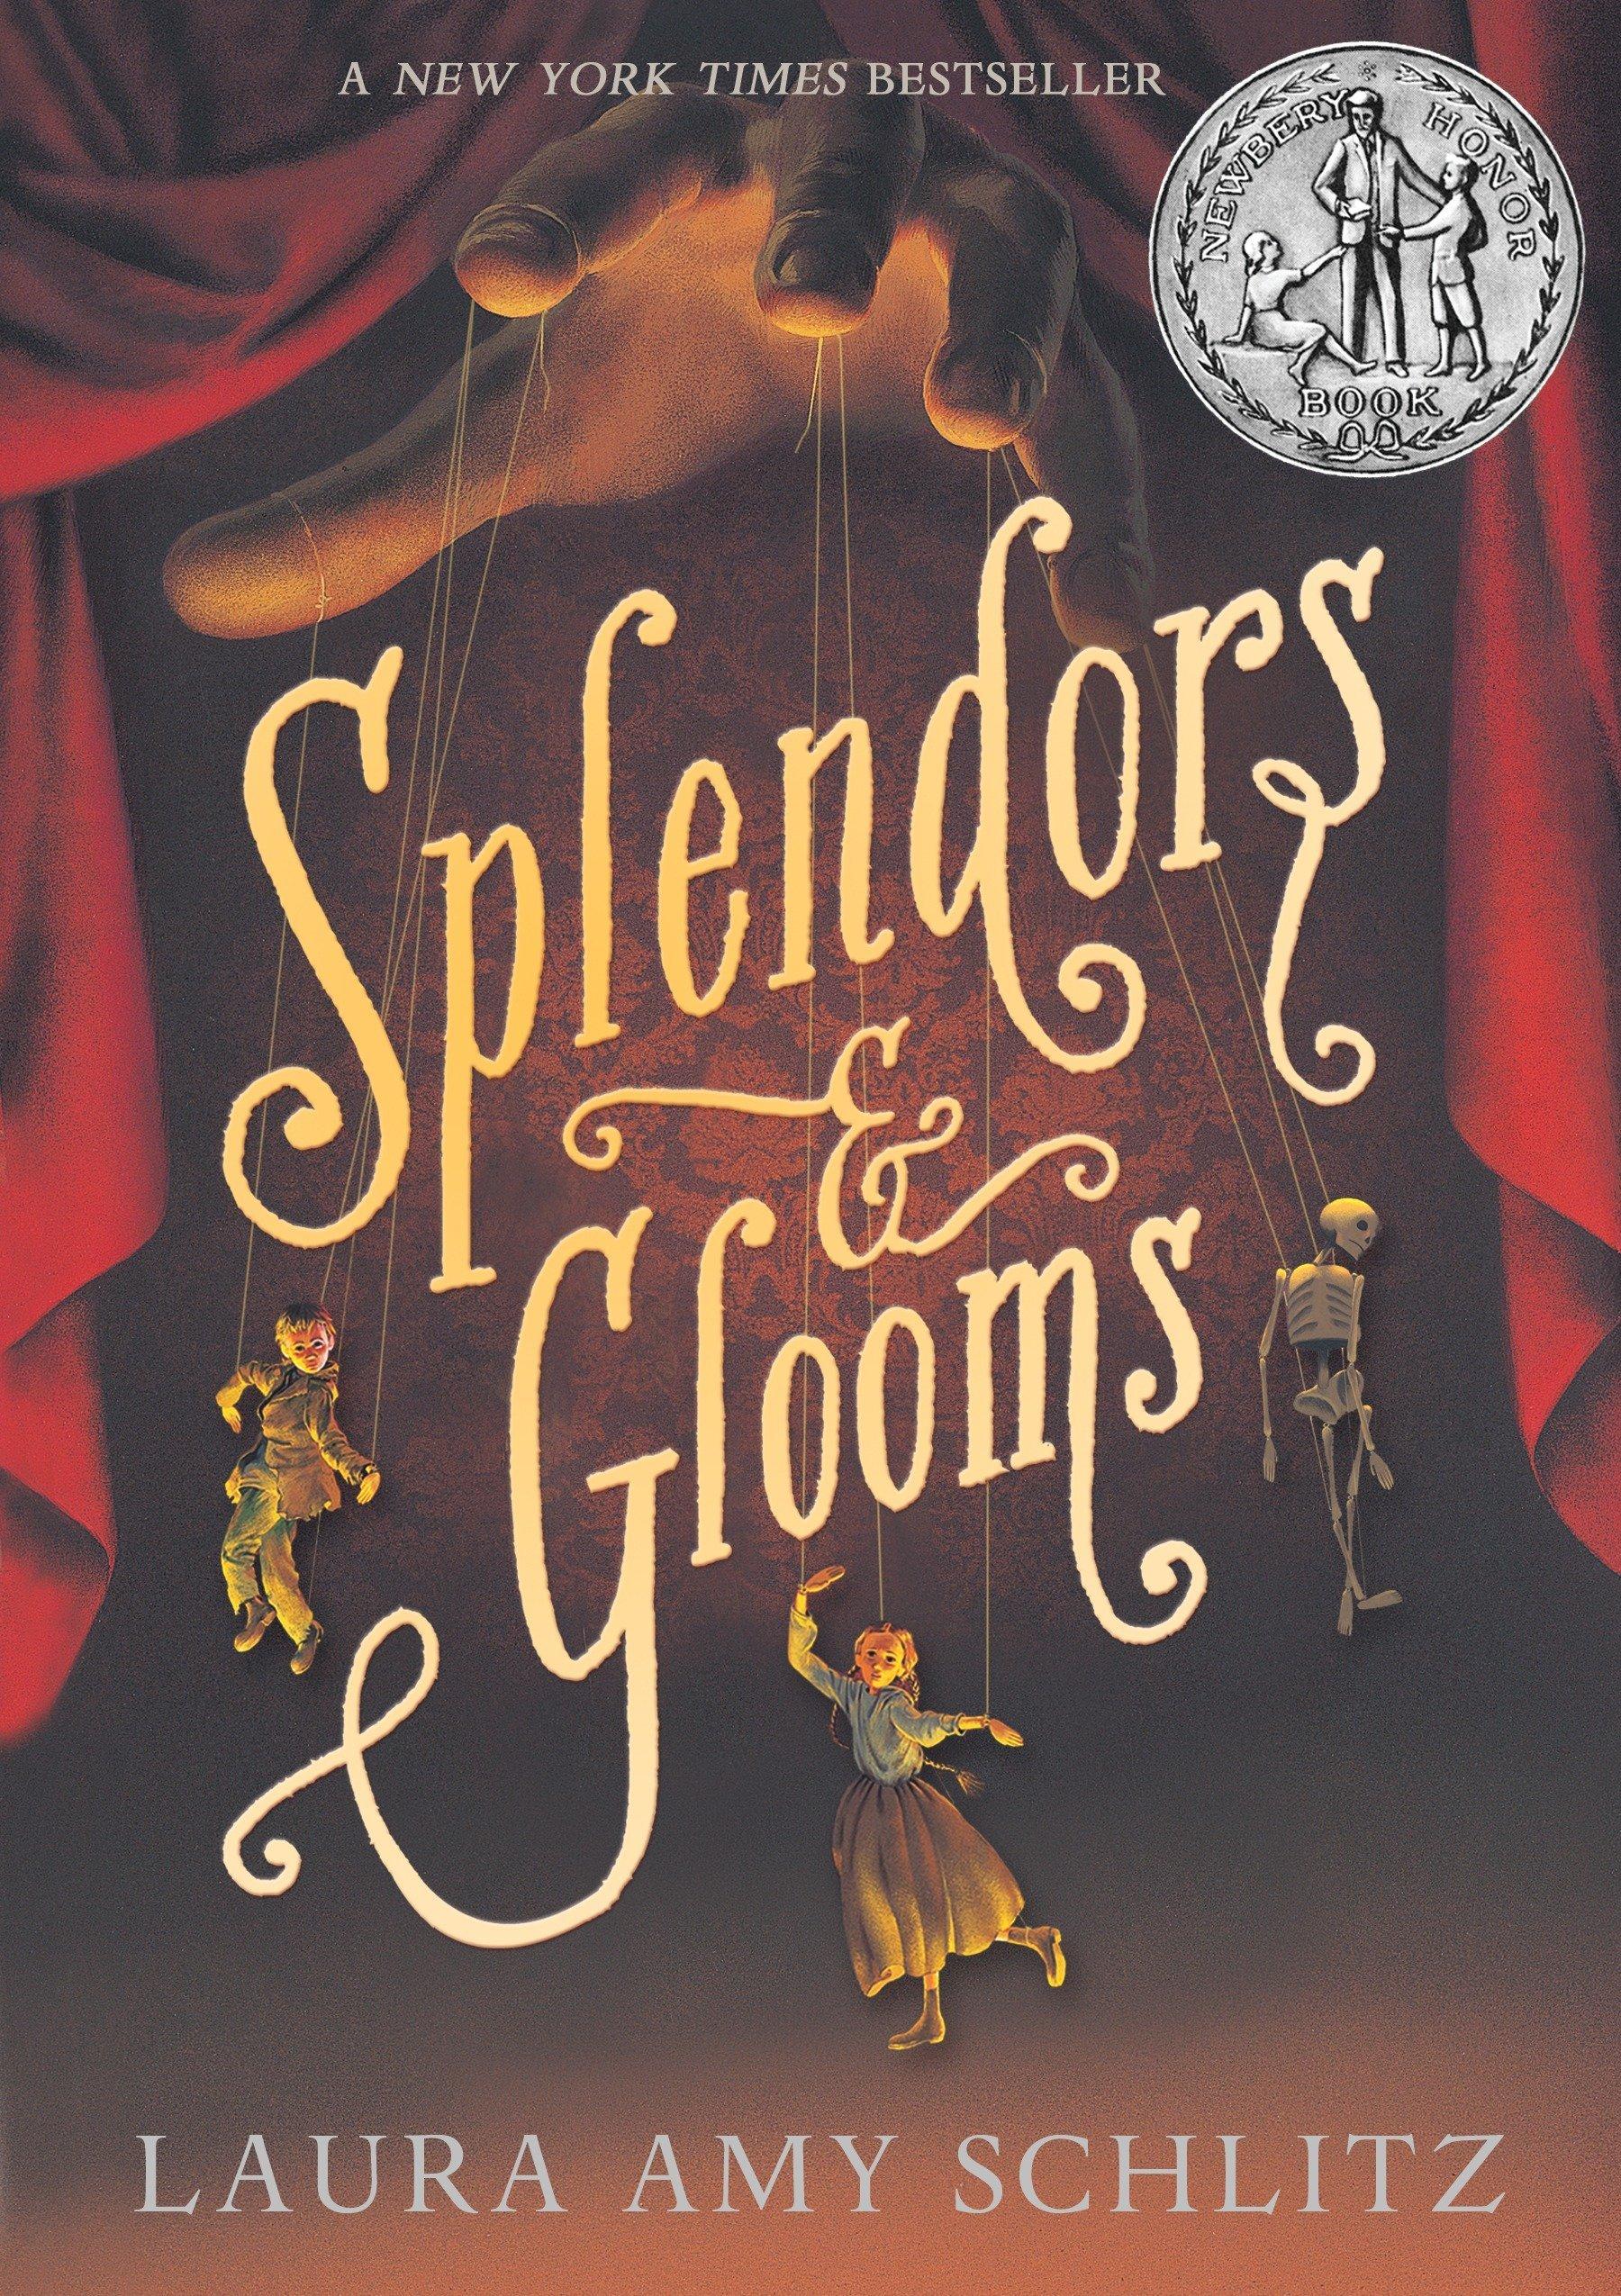 Splendors and Glooms: Laura Amy Schlitz: 9780763669263: Amazon.com: Books